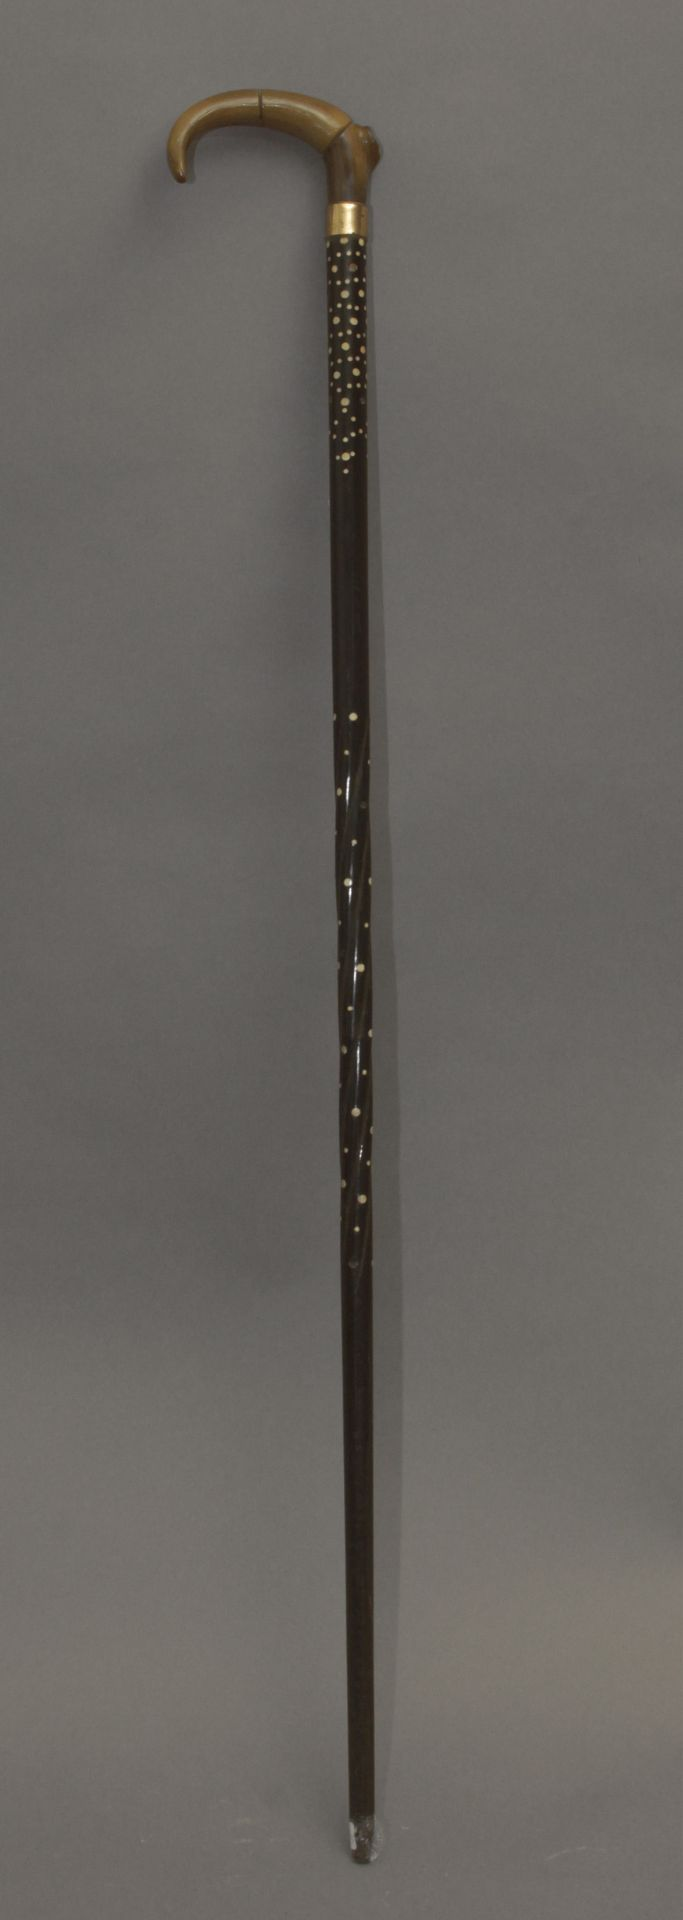 An Anglo-Indian walking stick circa 1900 - Bild 3 aus 5